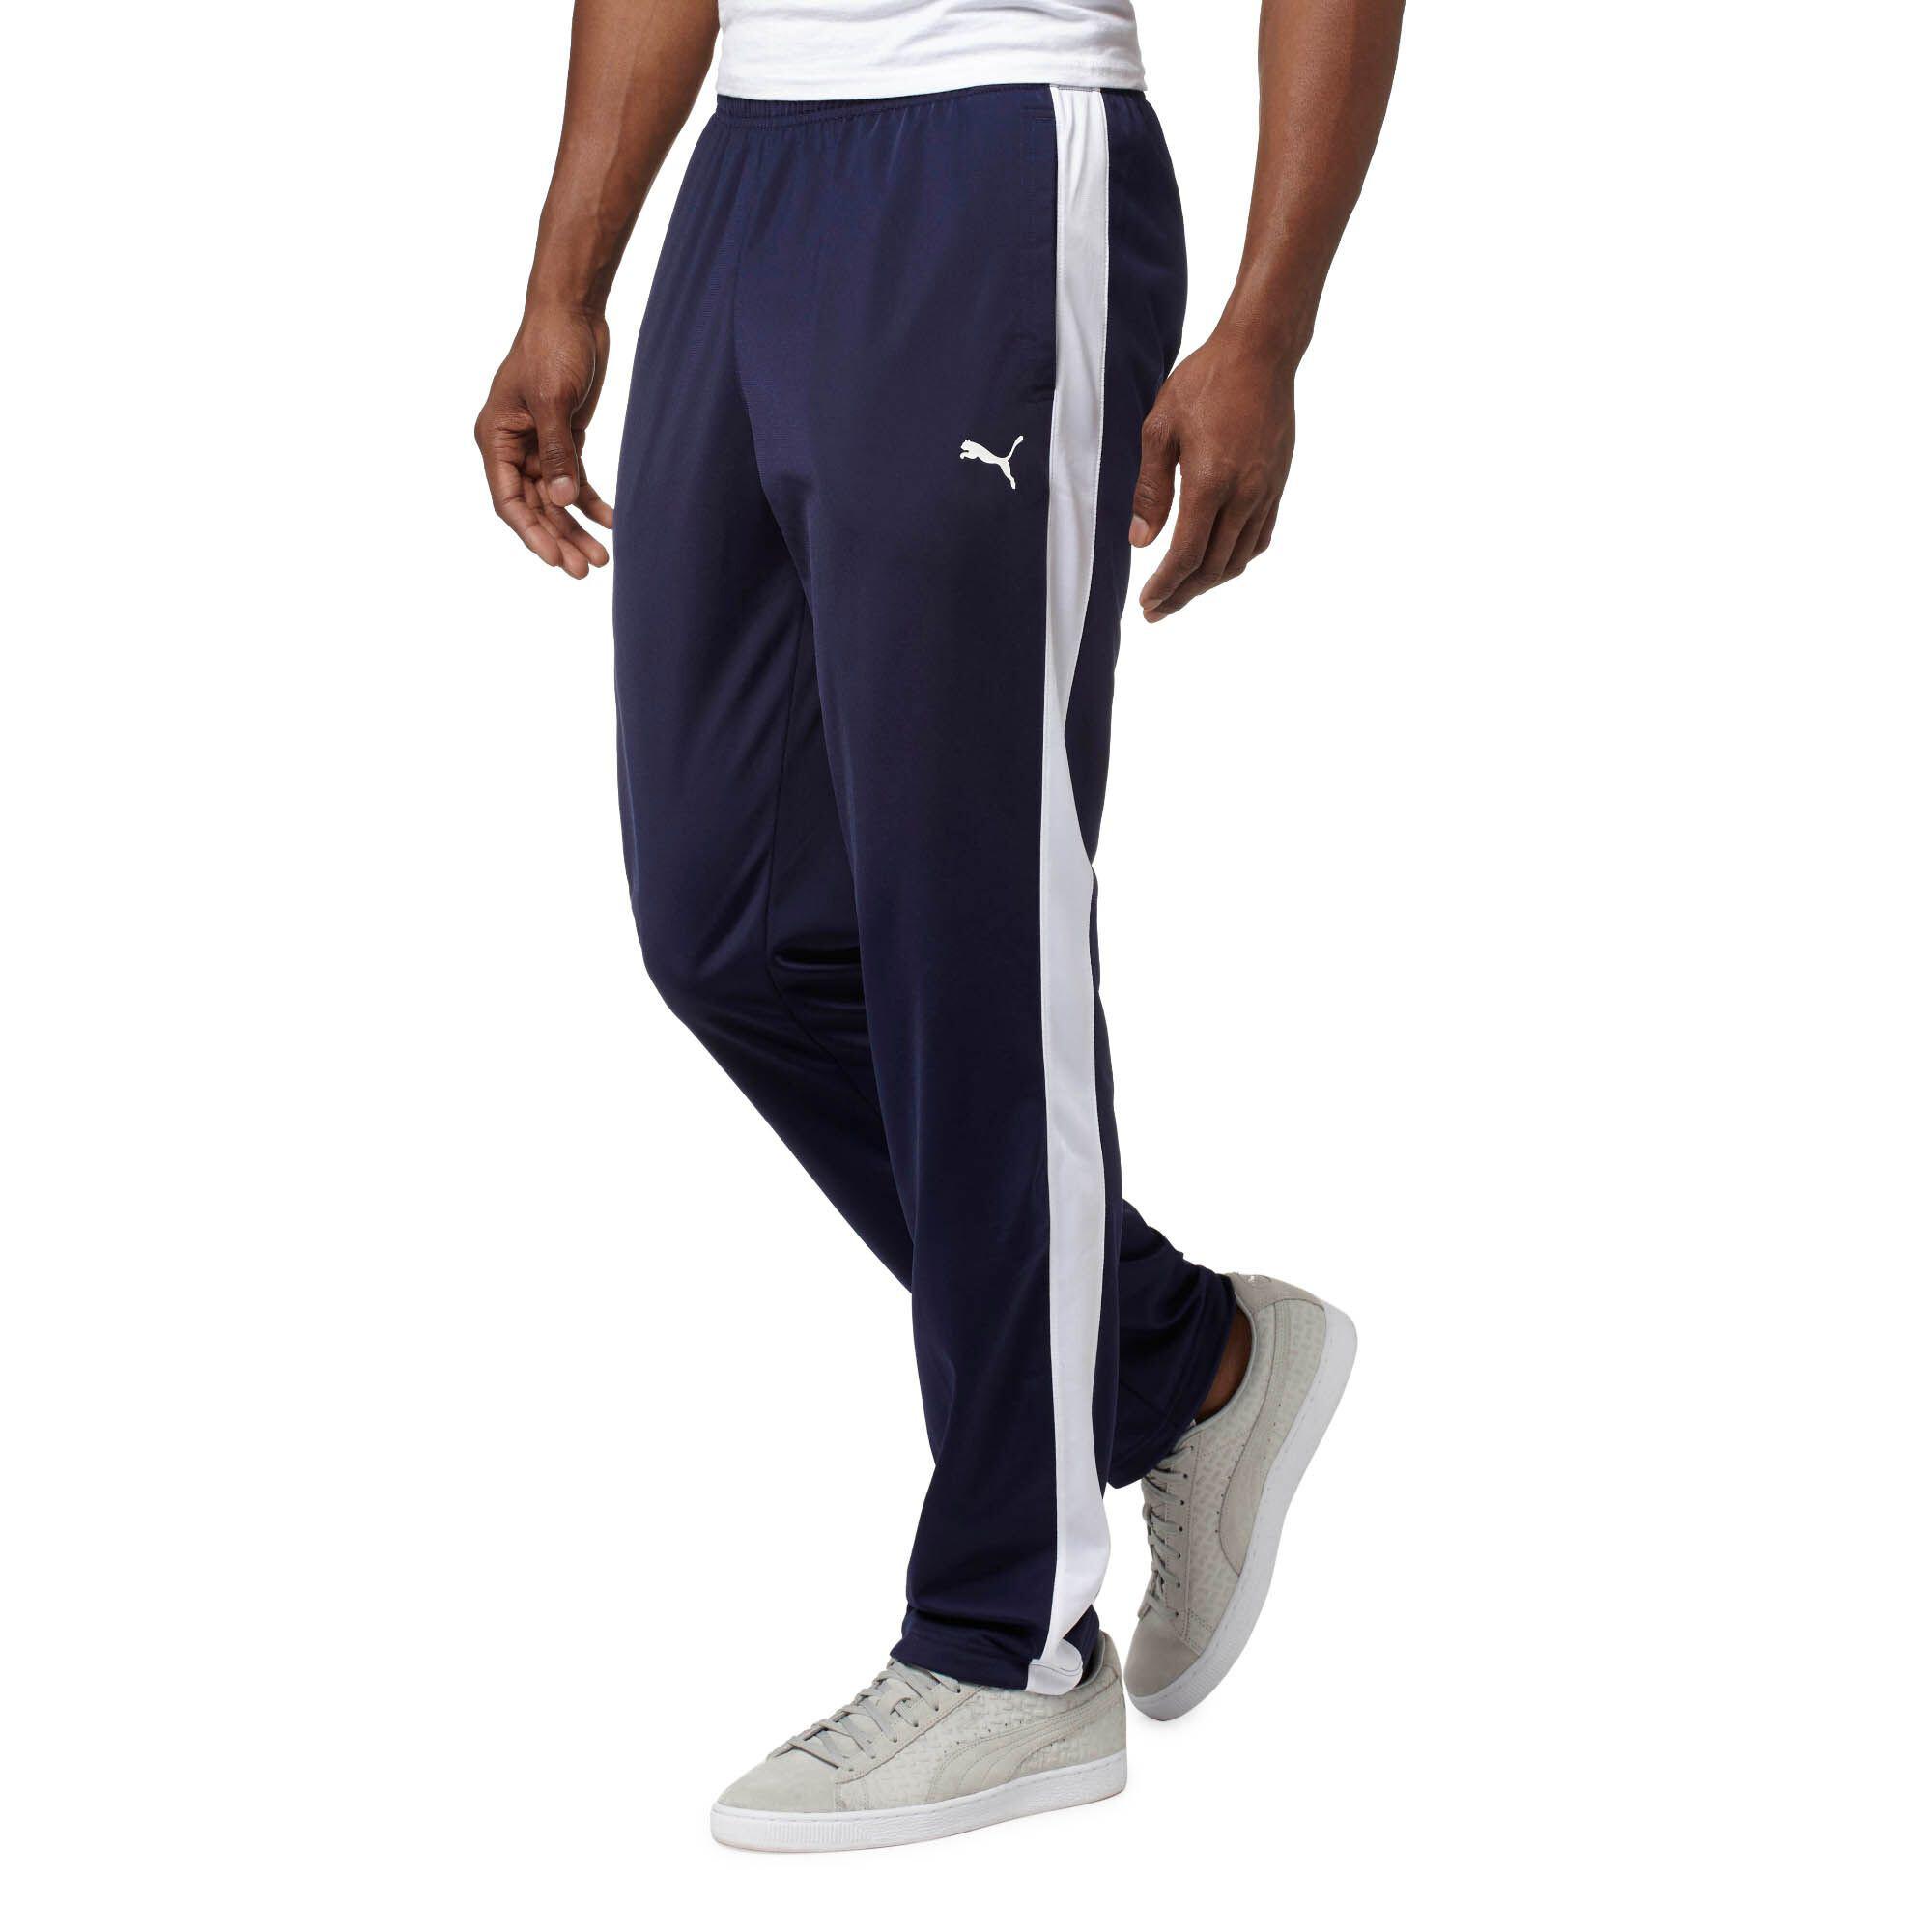 PUMA-Contrast-Open-Pants-Men-Knitted-Pants-Basics thumbnail 10